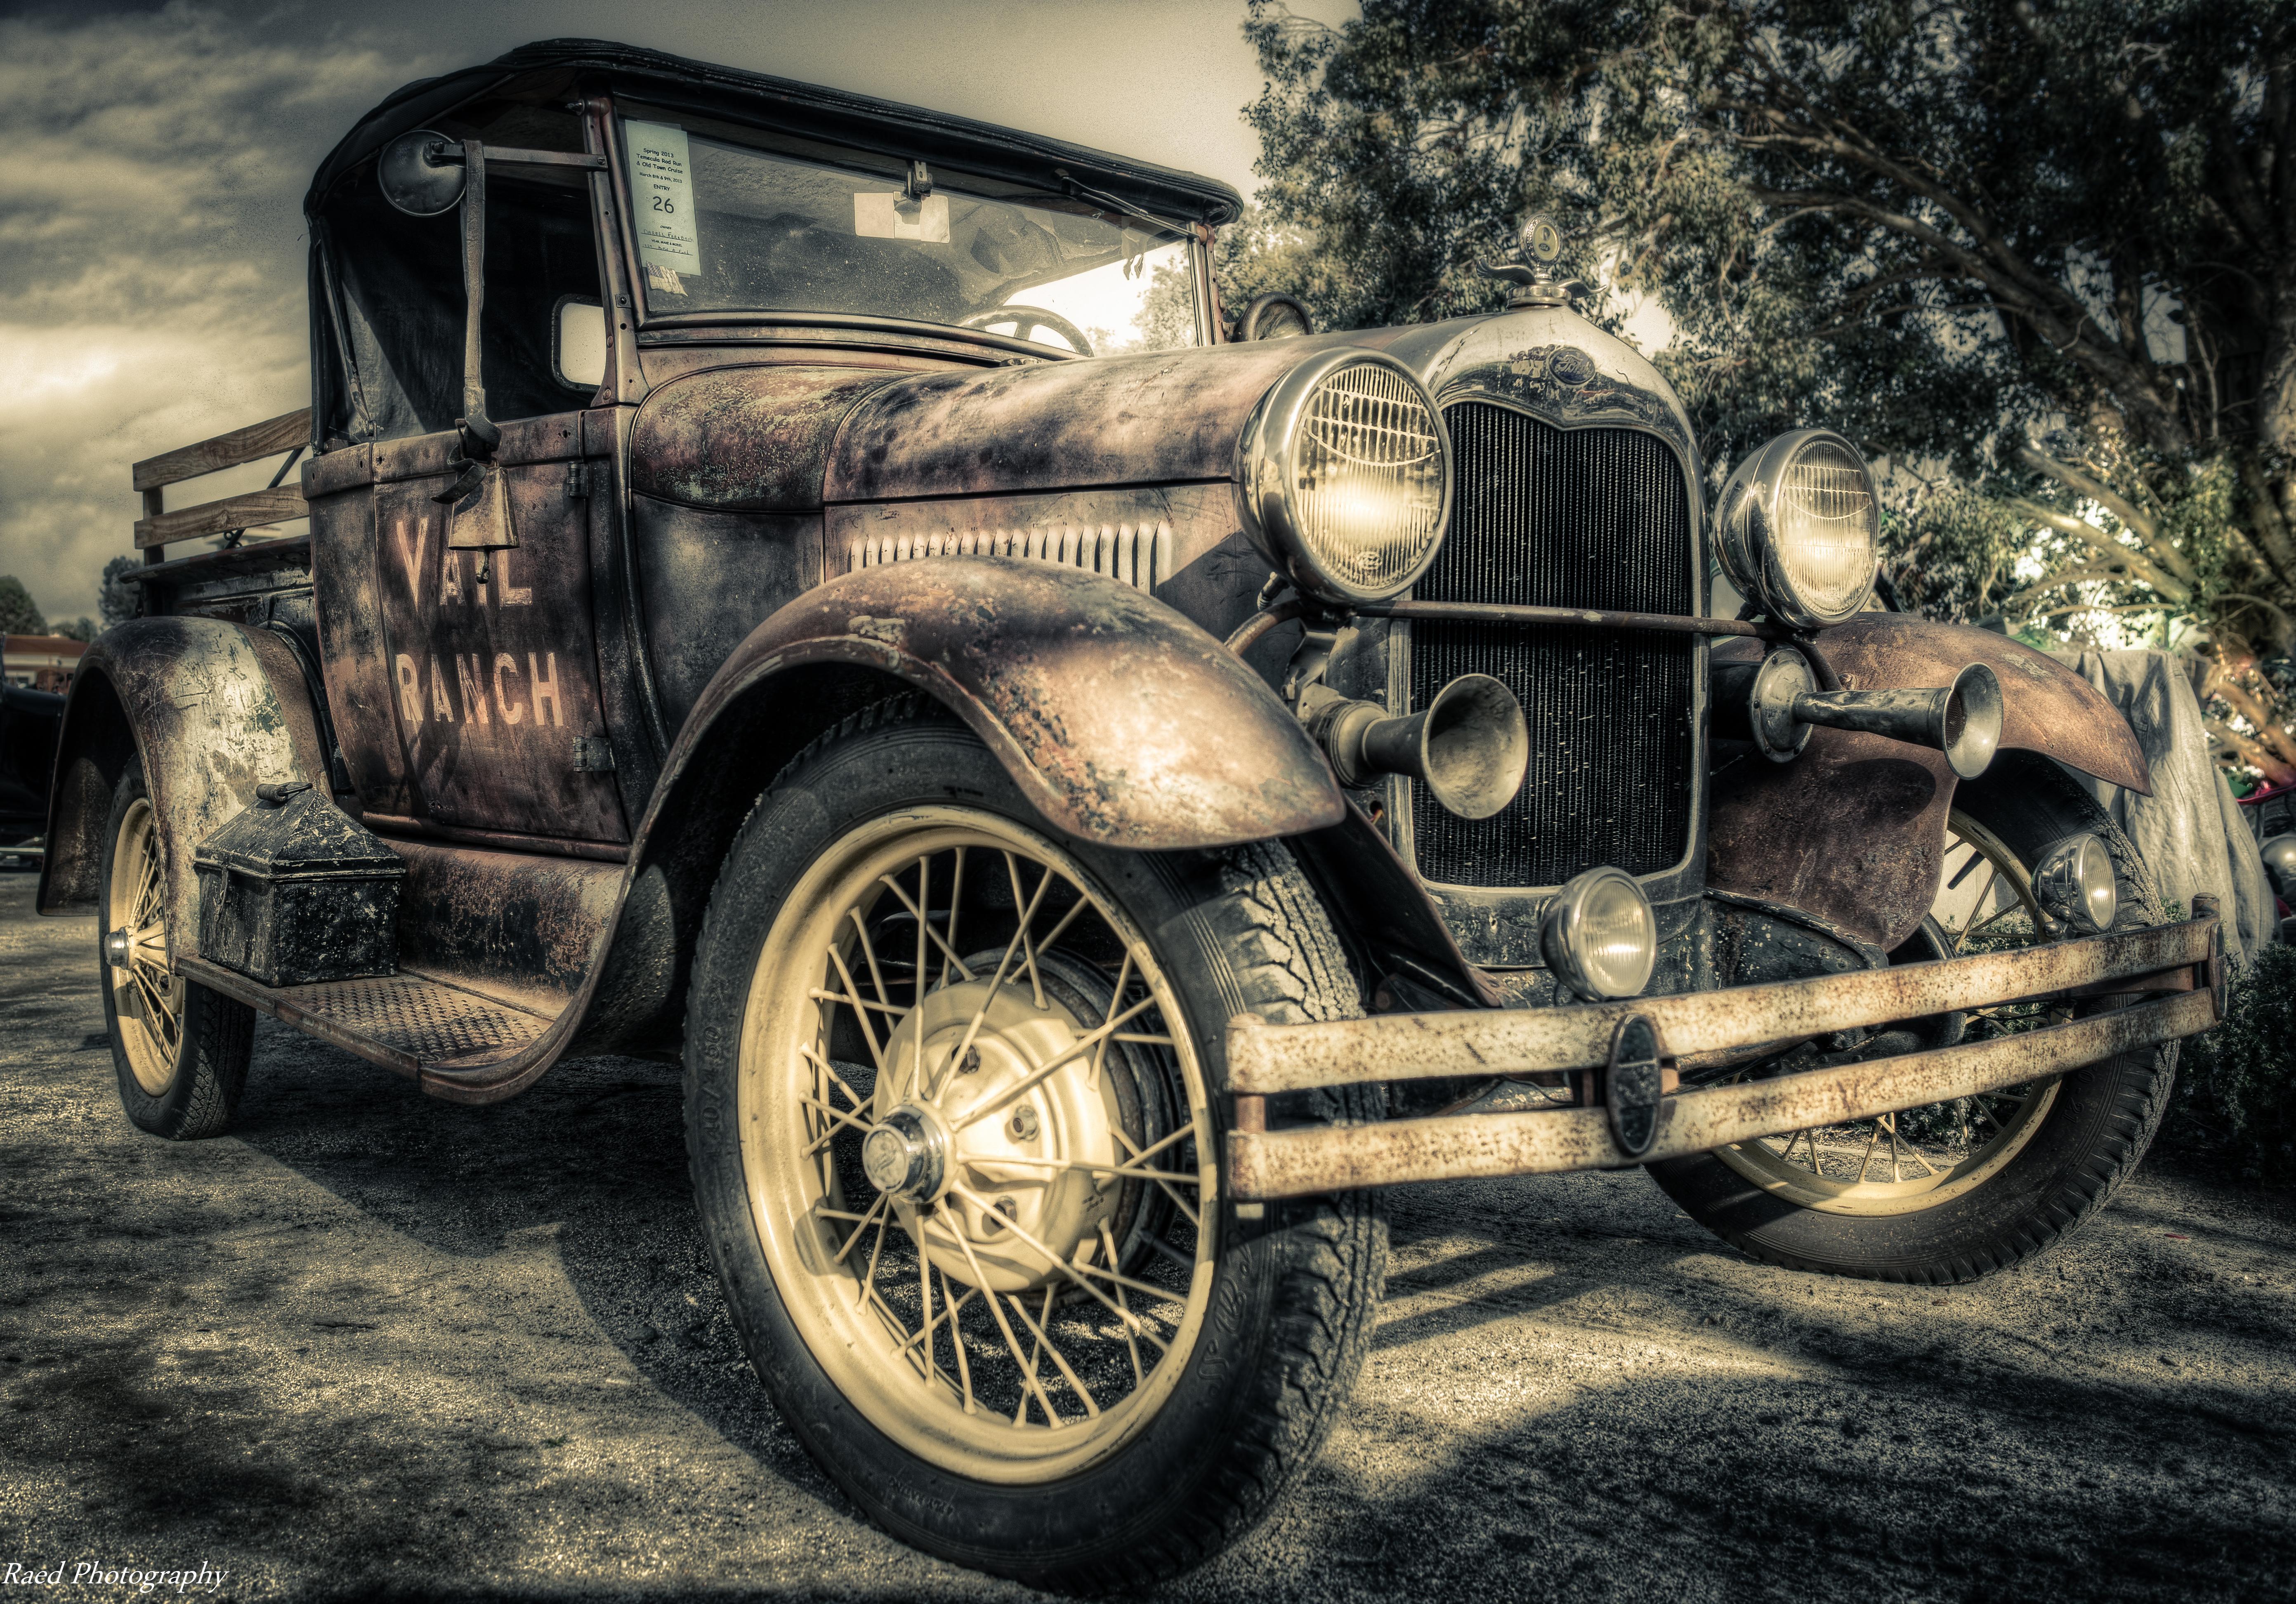 Vintage car | My Camera Journal